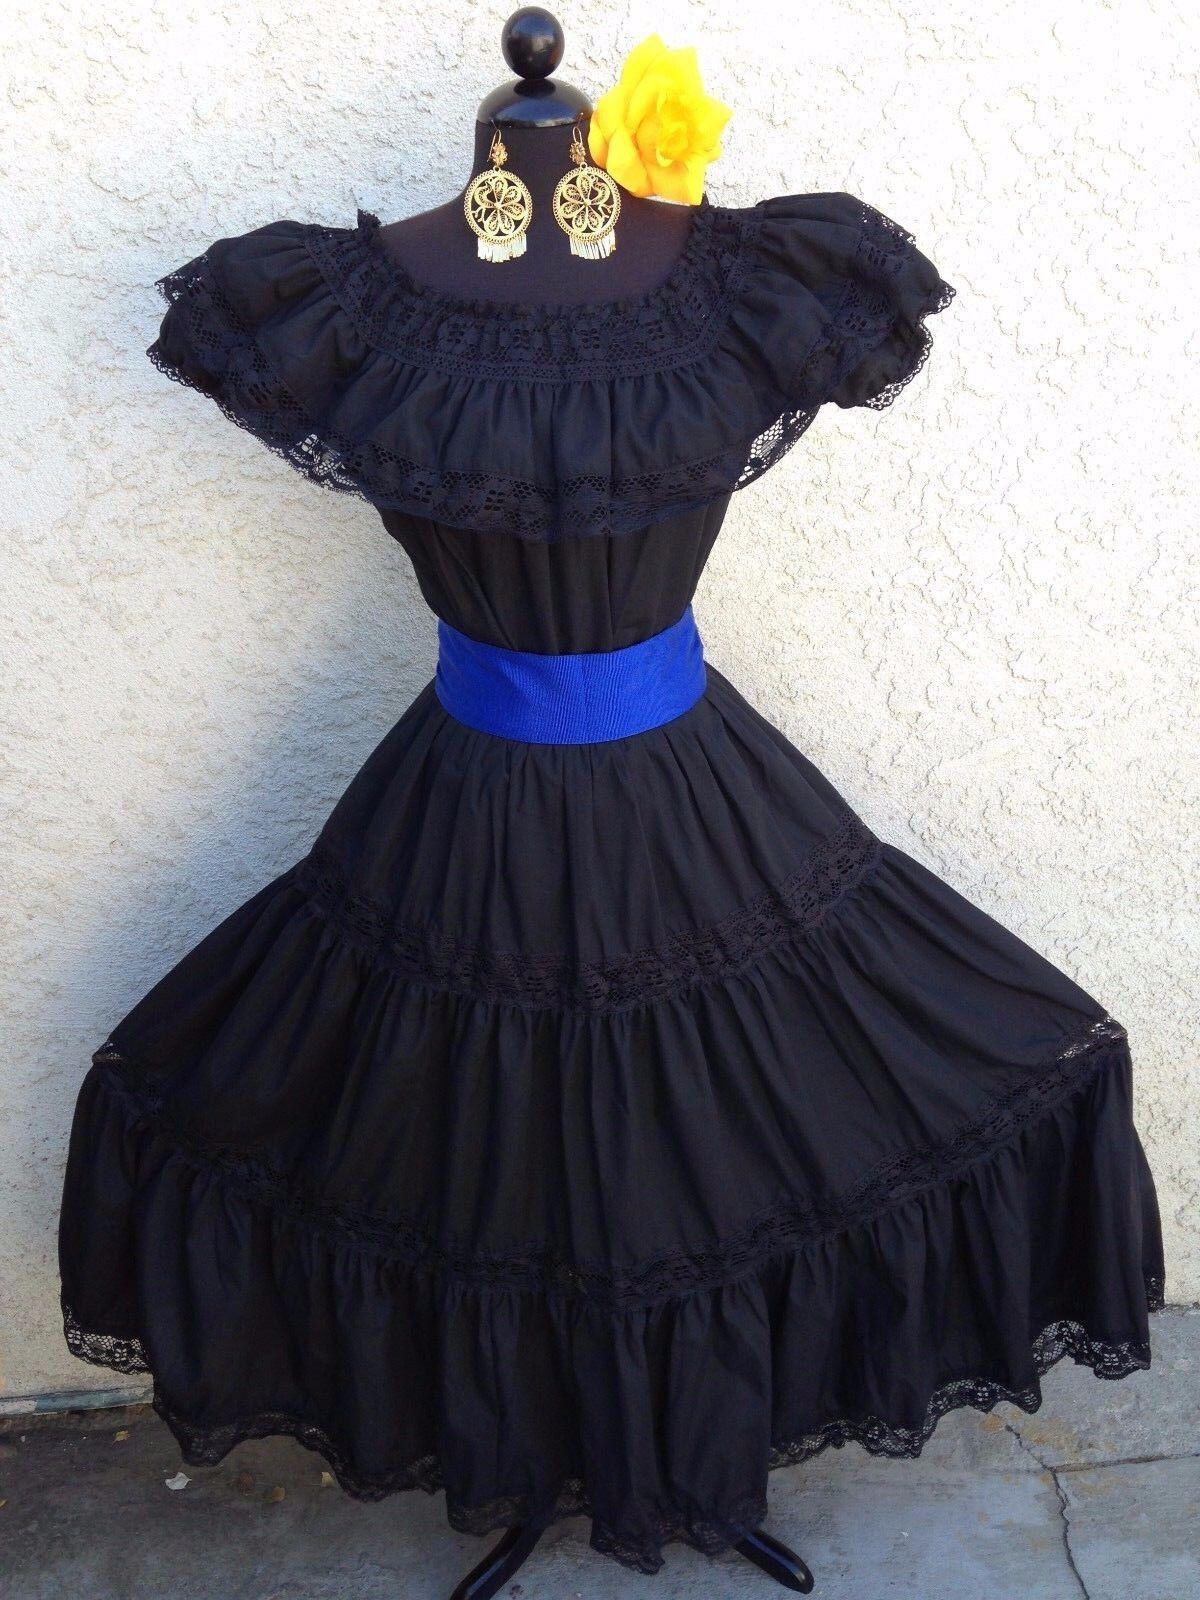 MEXICAN DRESS  FIESTA,5 DE MAYO,DAY OF THE DEAD OFF SHOULDER W RUFFLE 2 PIECE